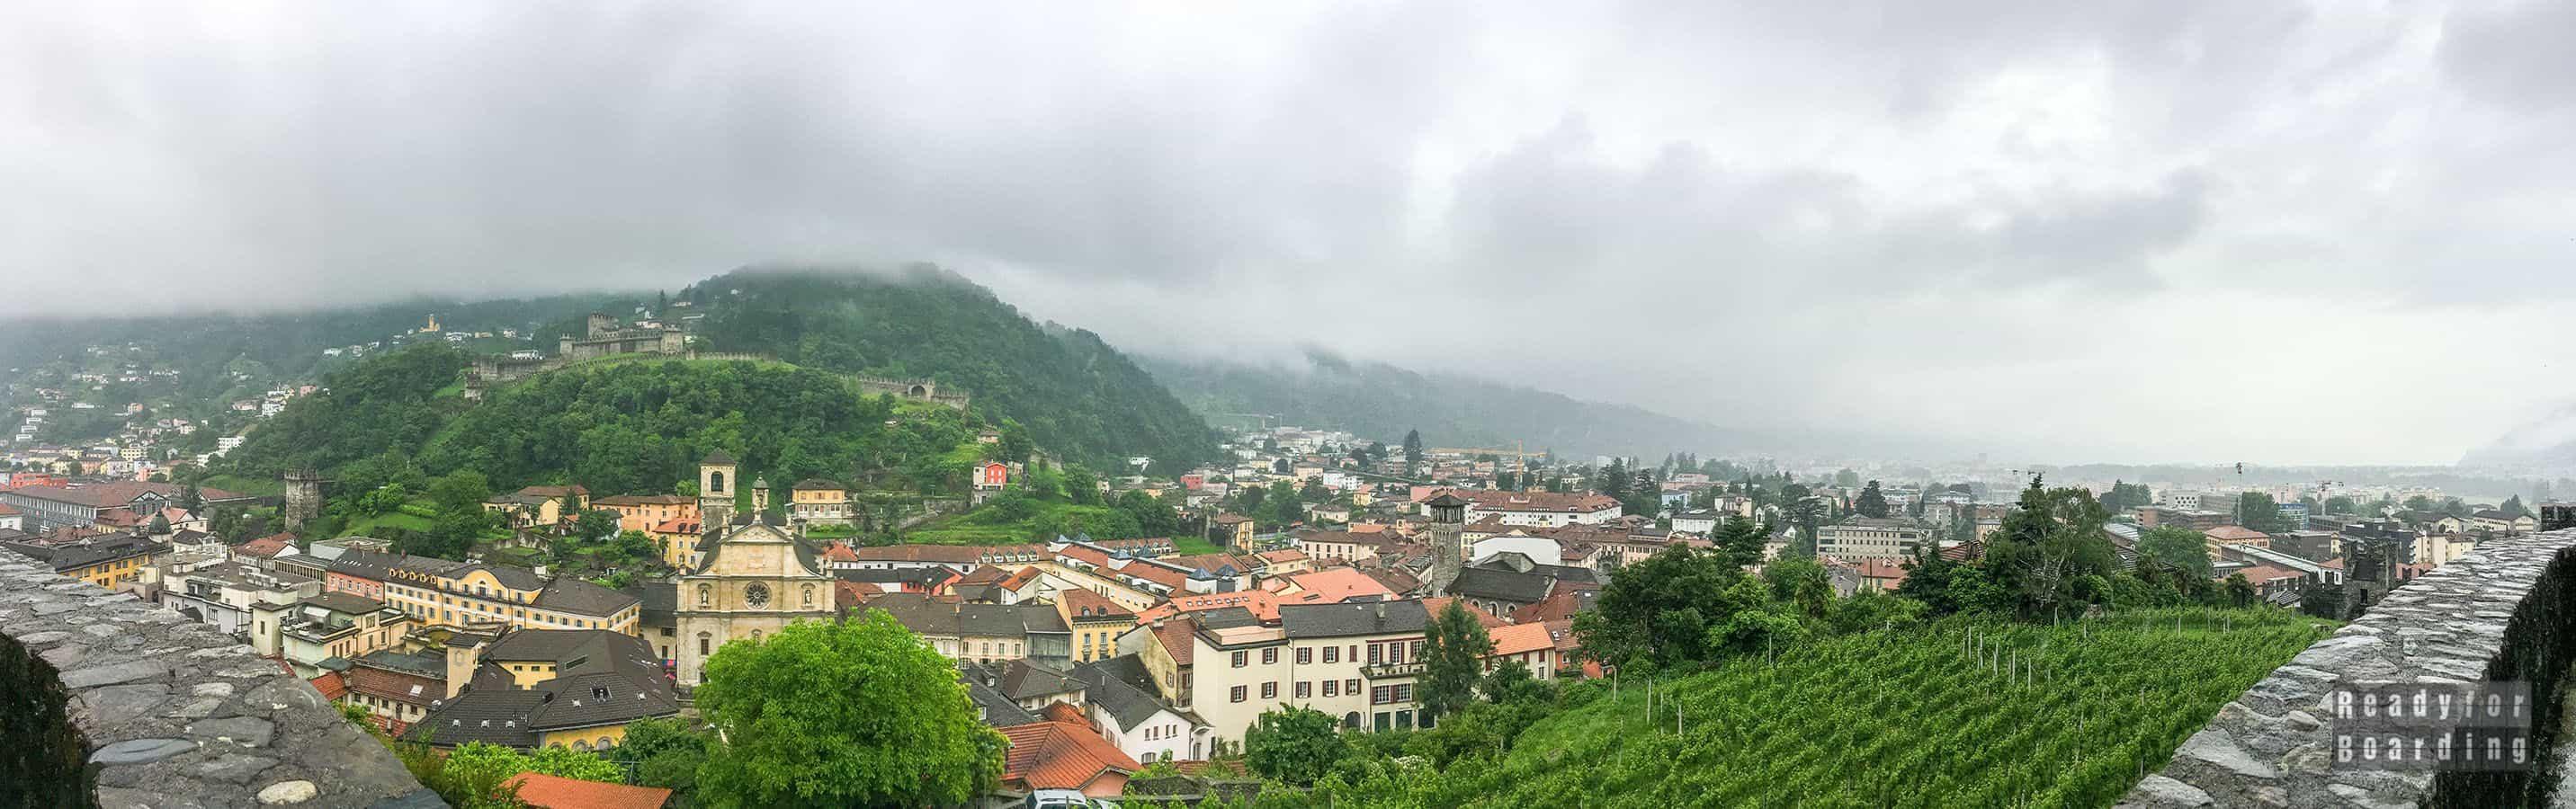 Panorama: Castelgrande, Bellinzona - Szwajcaria